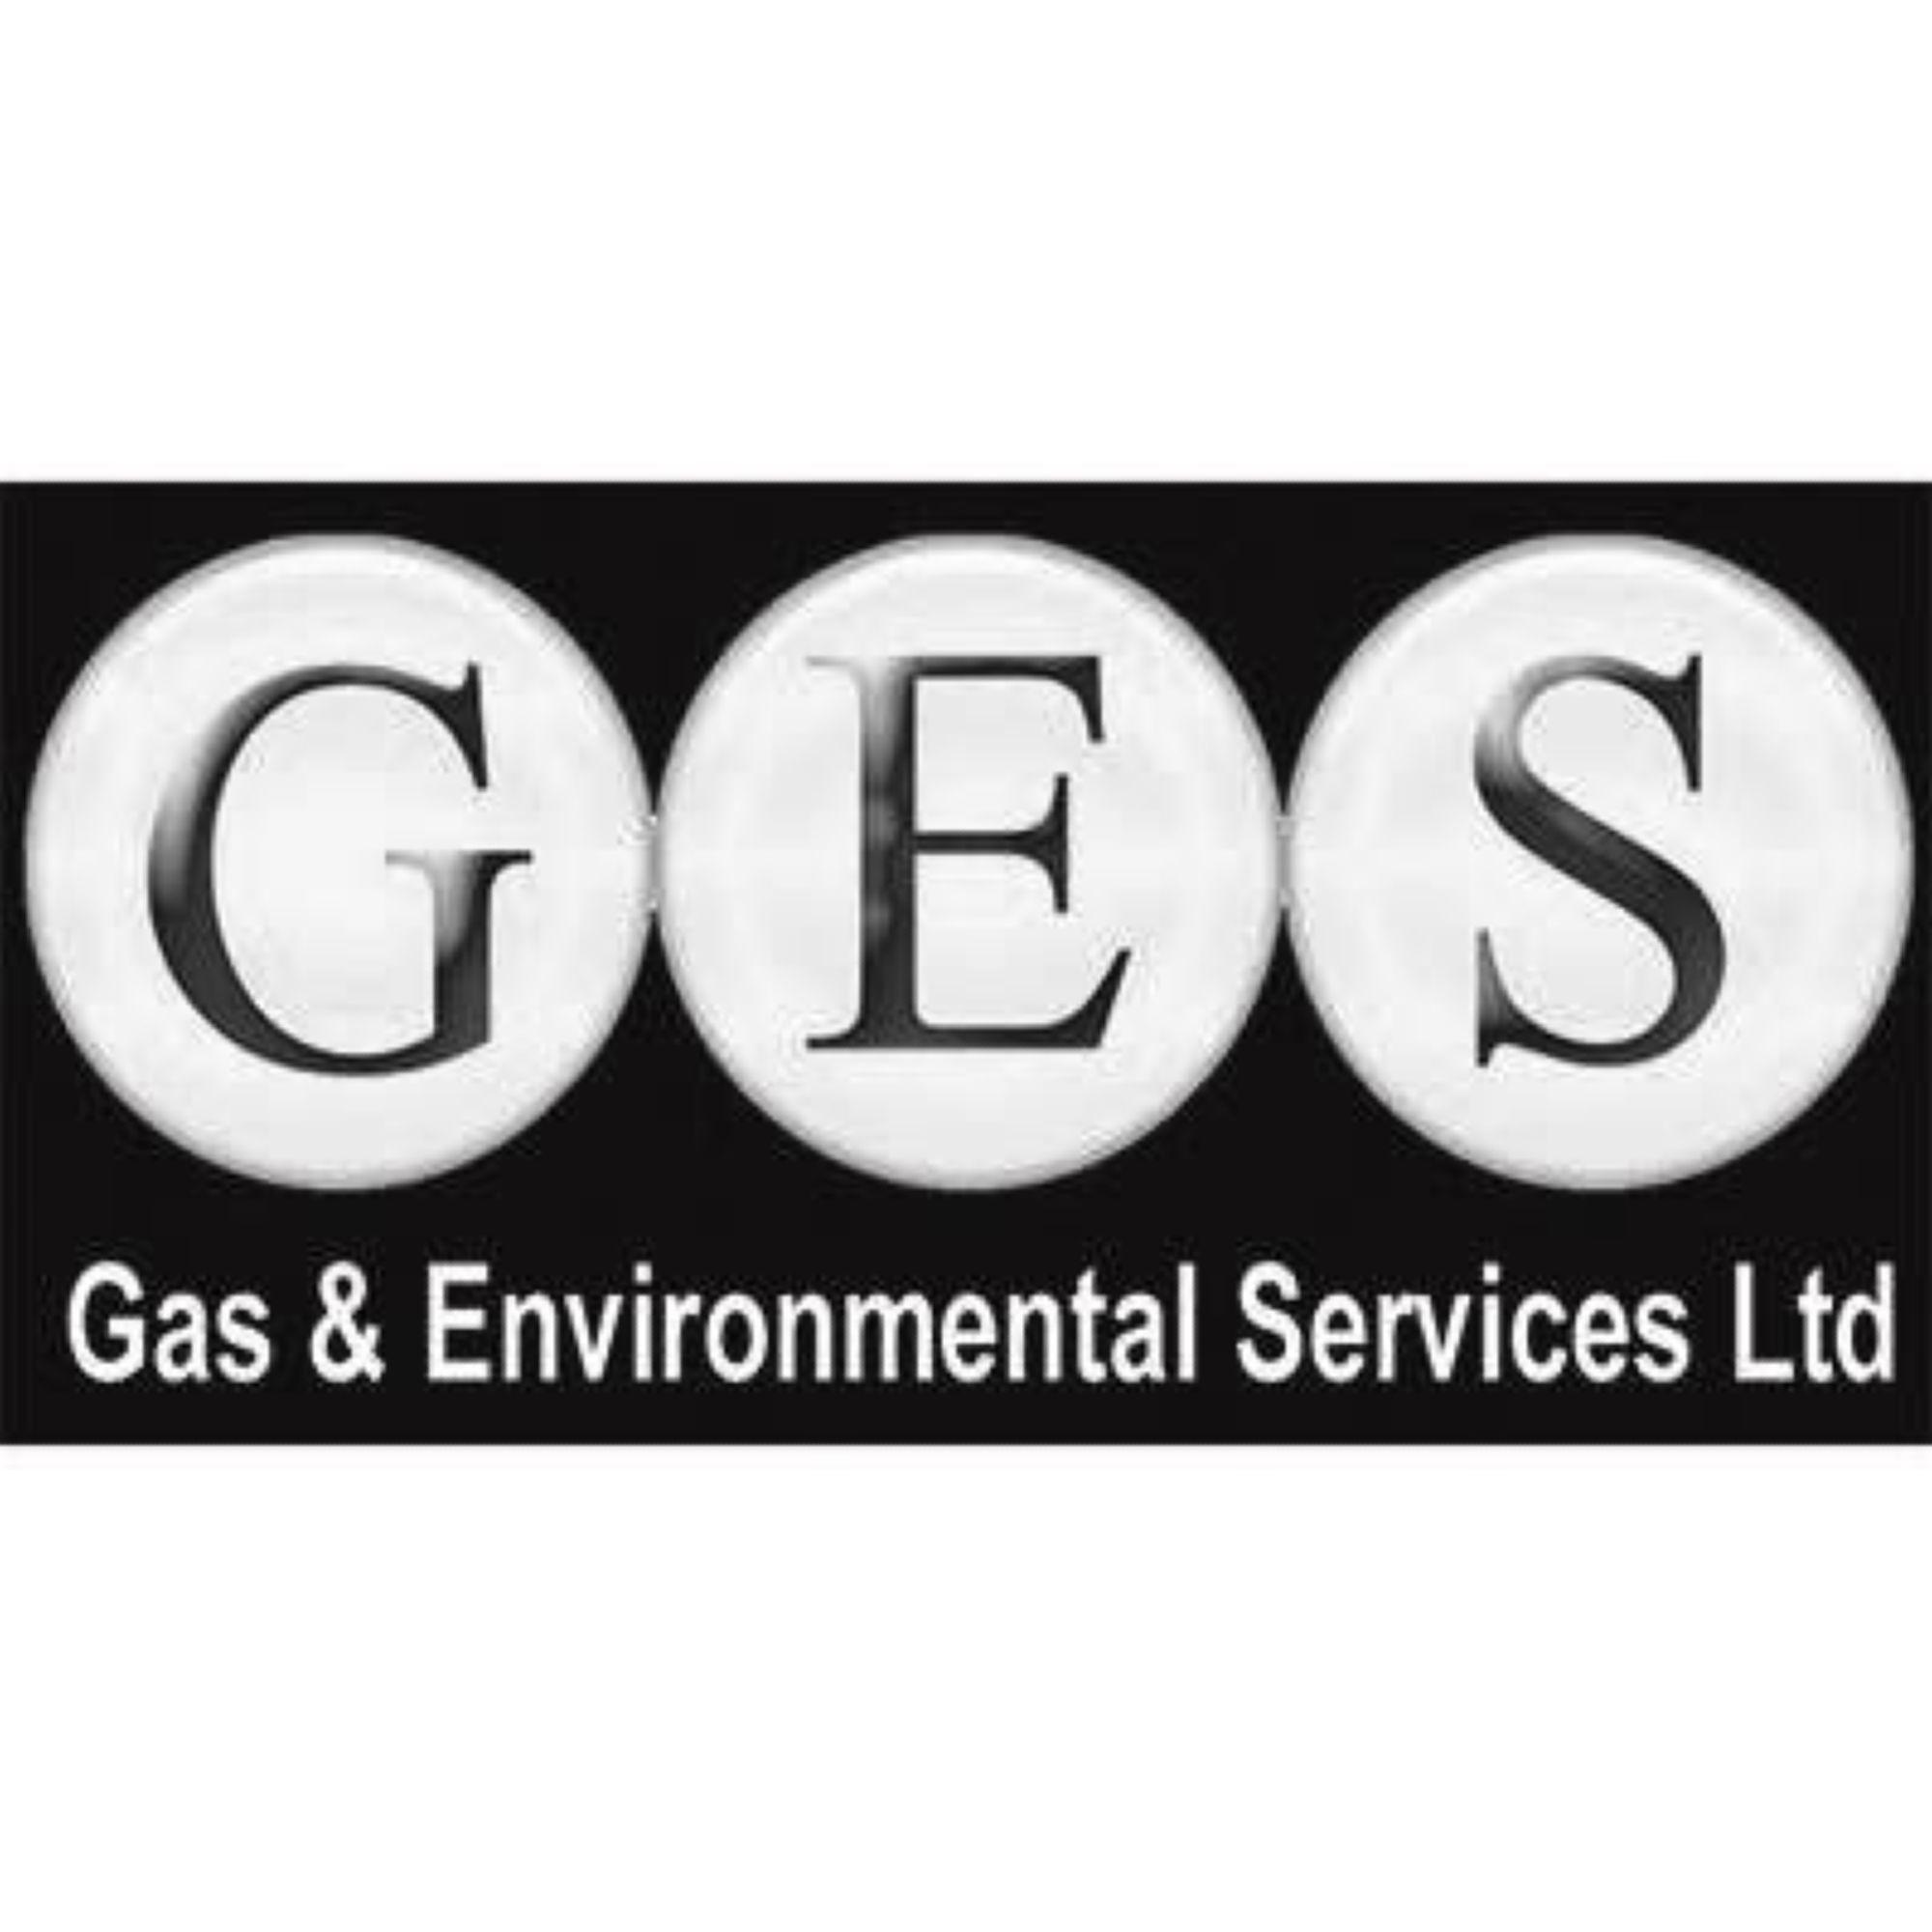 ges_mono_logo.jpg